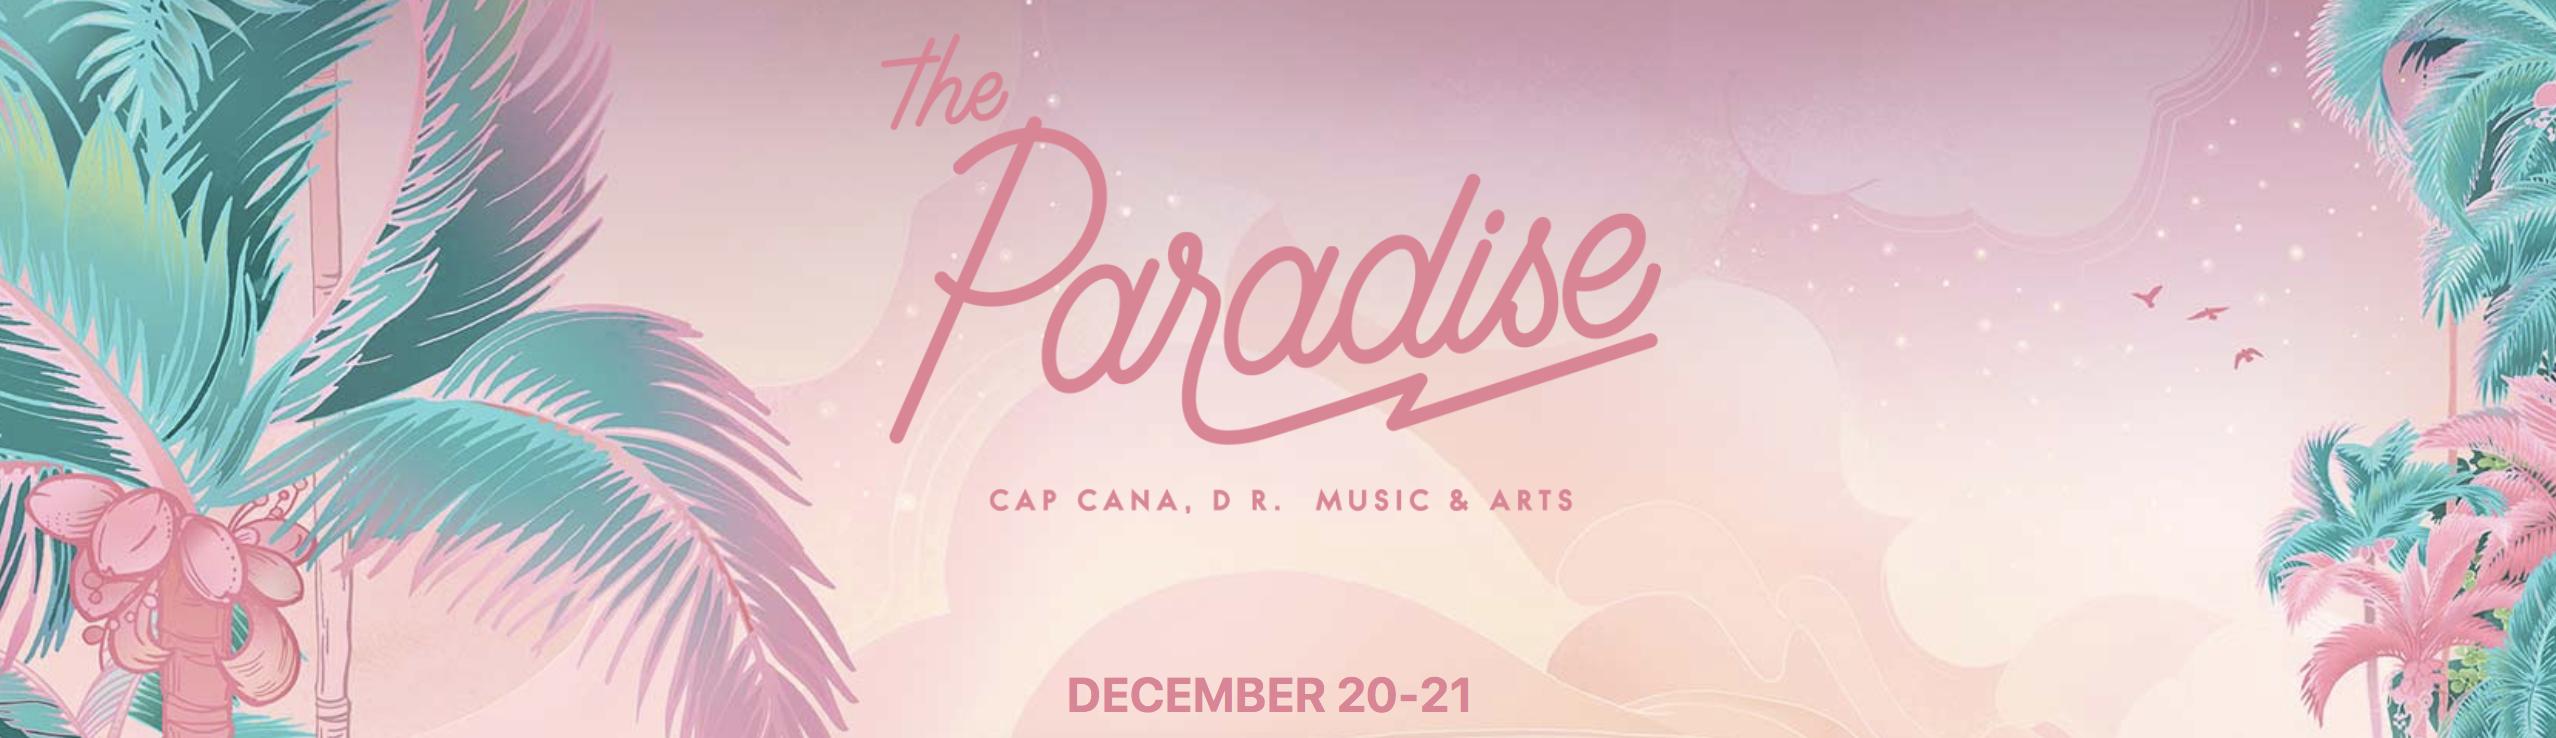 The Paradise Festival DR 2019